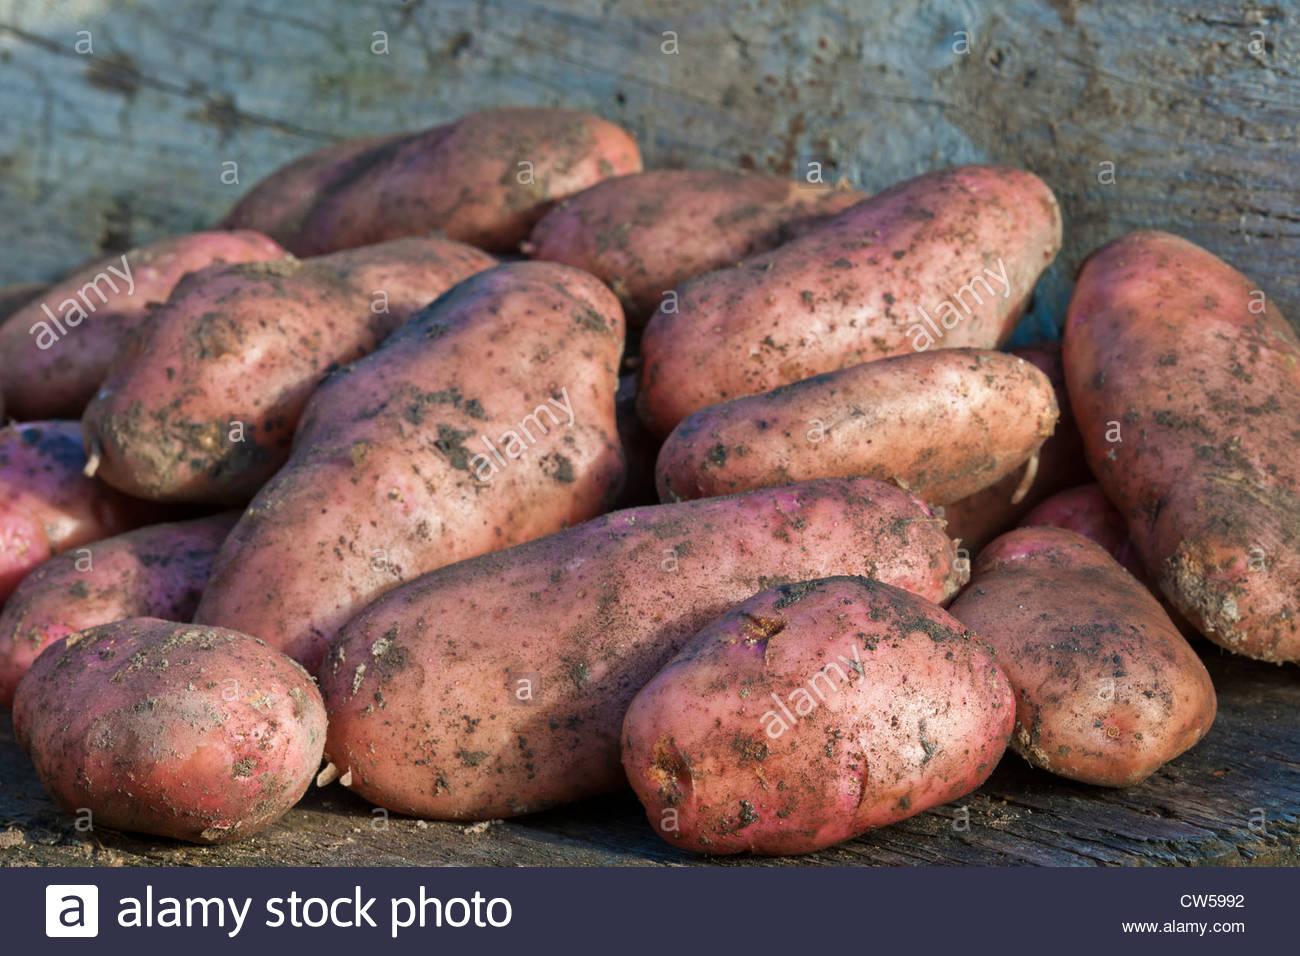 Kartoffel Sarpo Una gegraben frisch geernteten frühen Hauptkultur Sommer August selbst angebauten voll Erde Stockbild